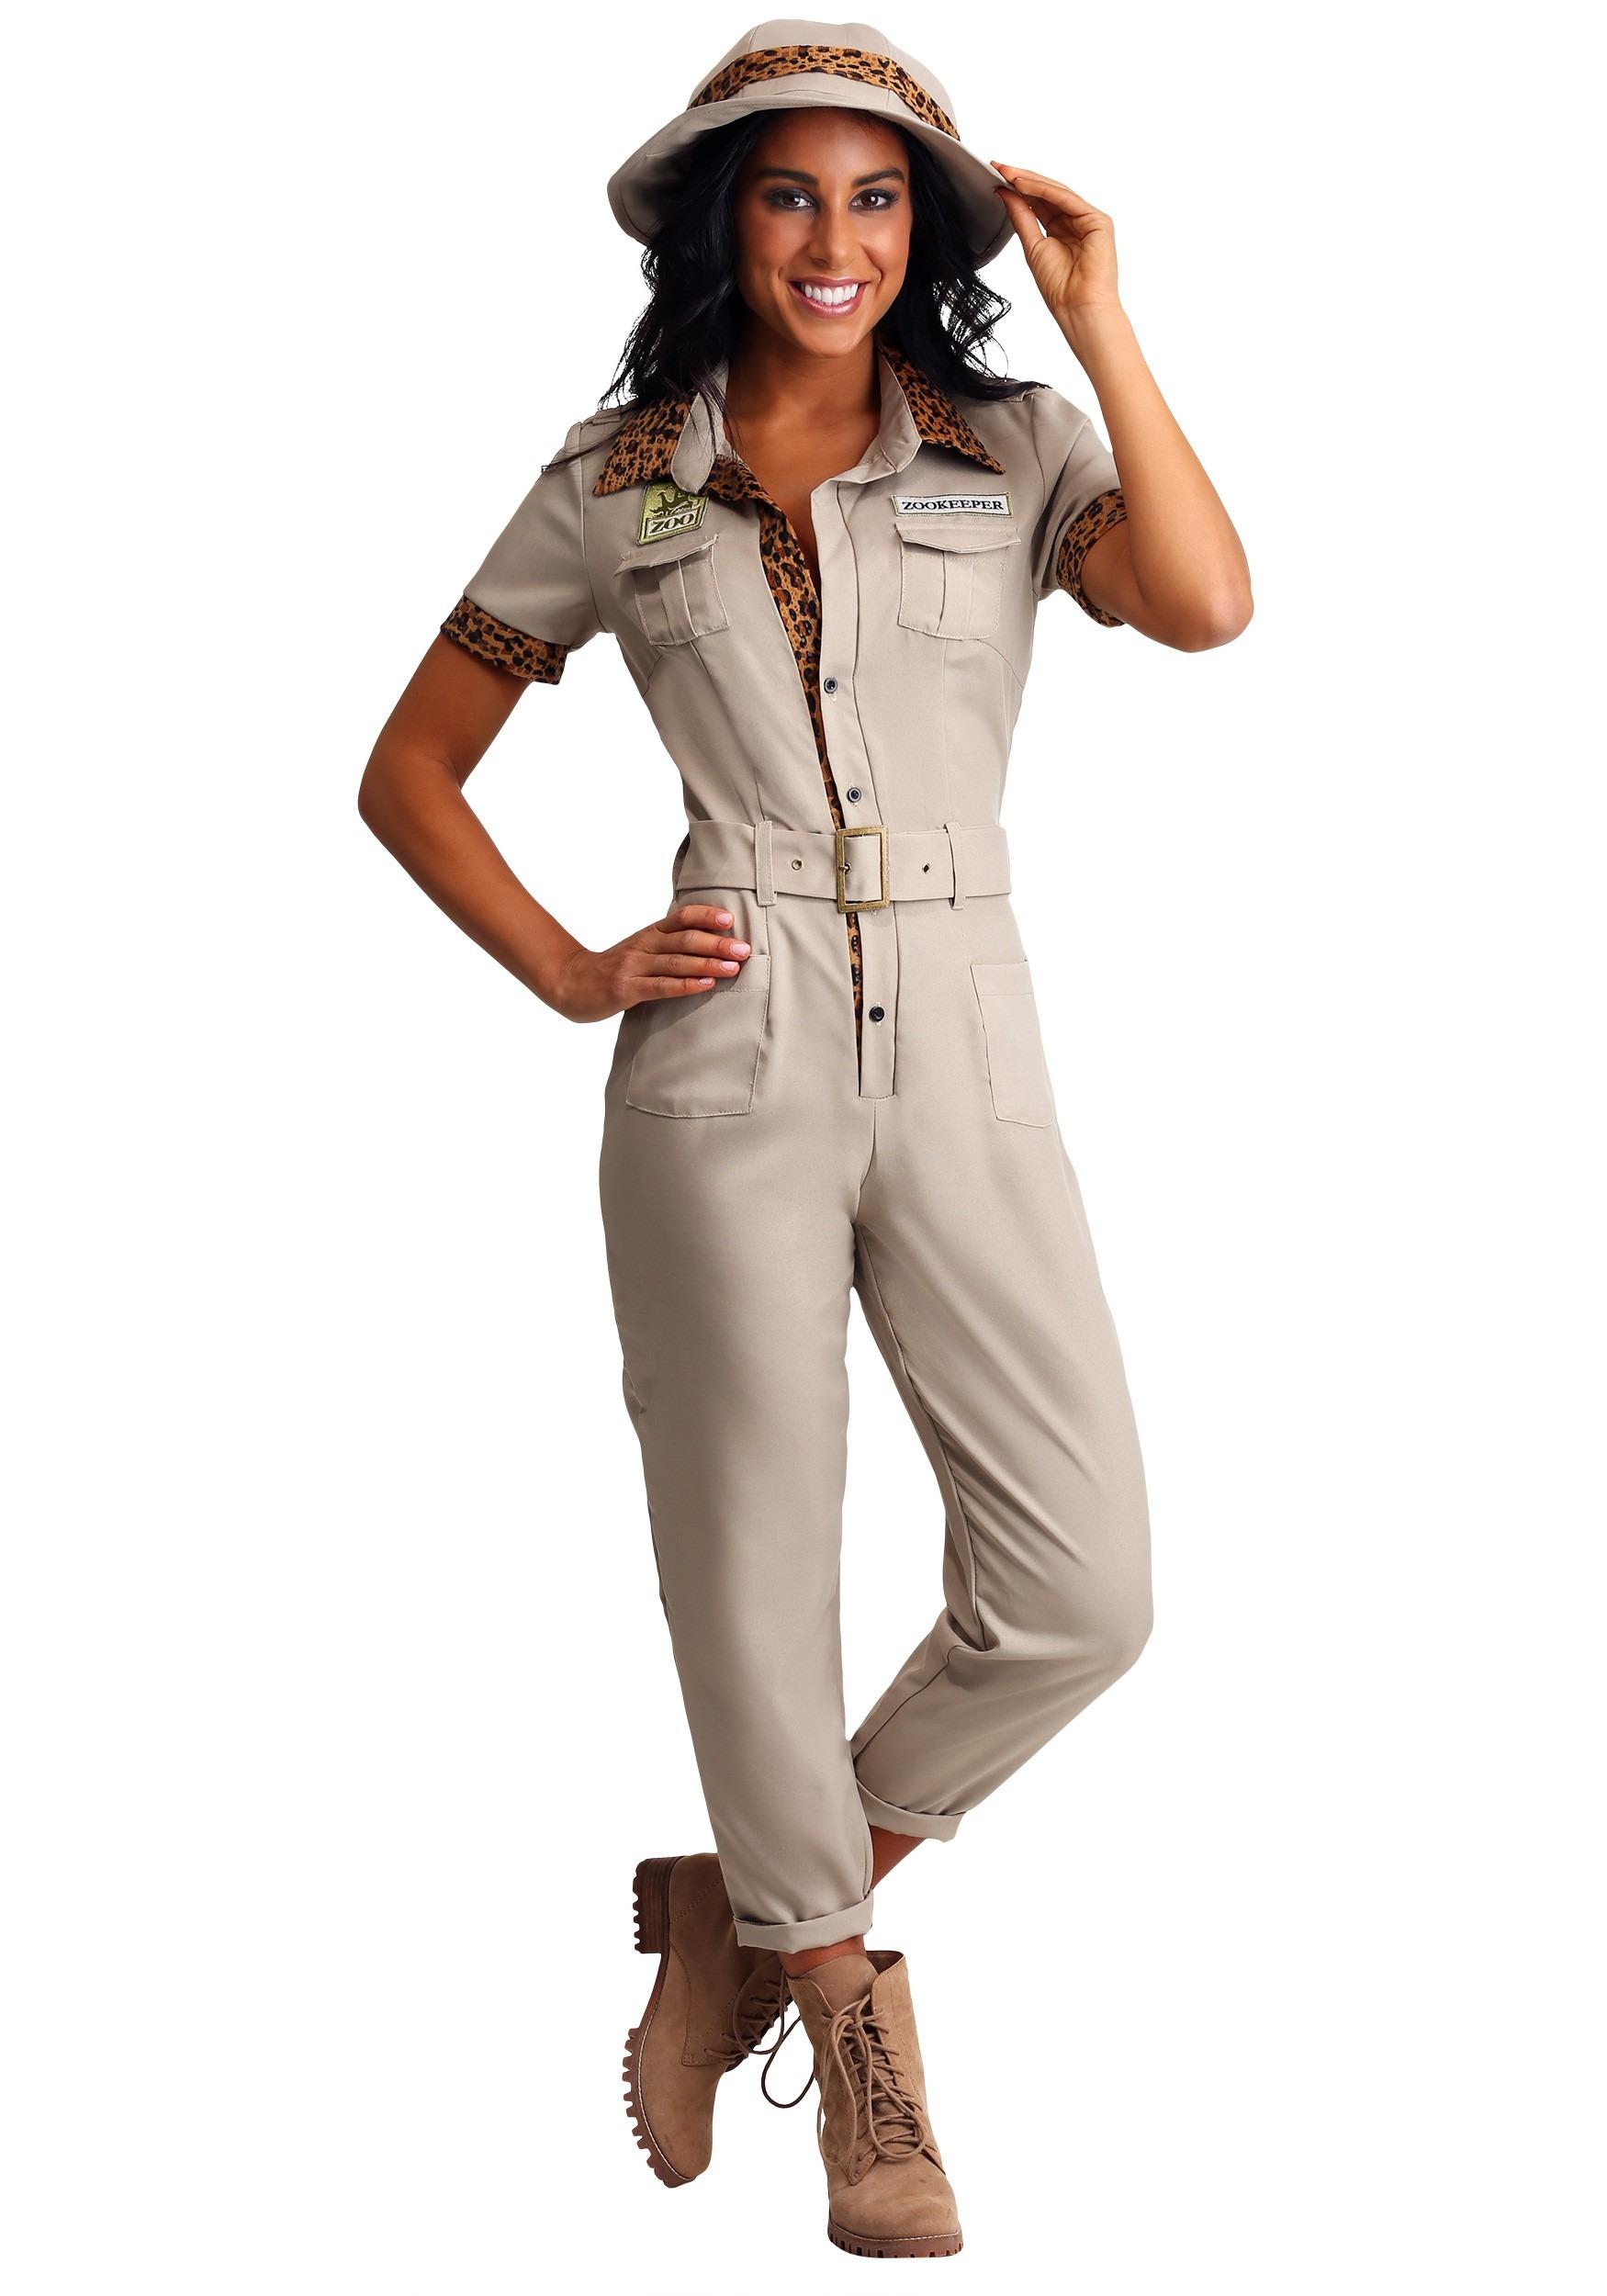 Womens Zookeeper Costume